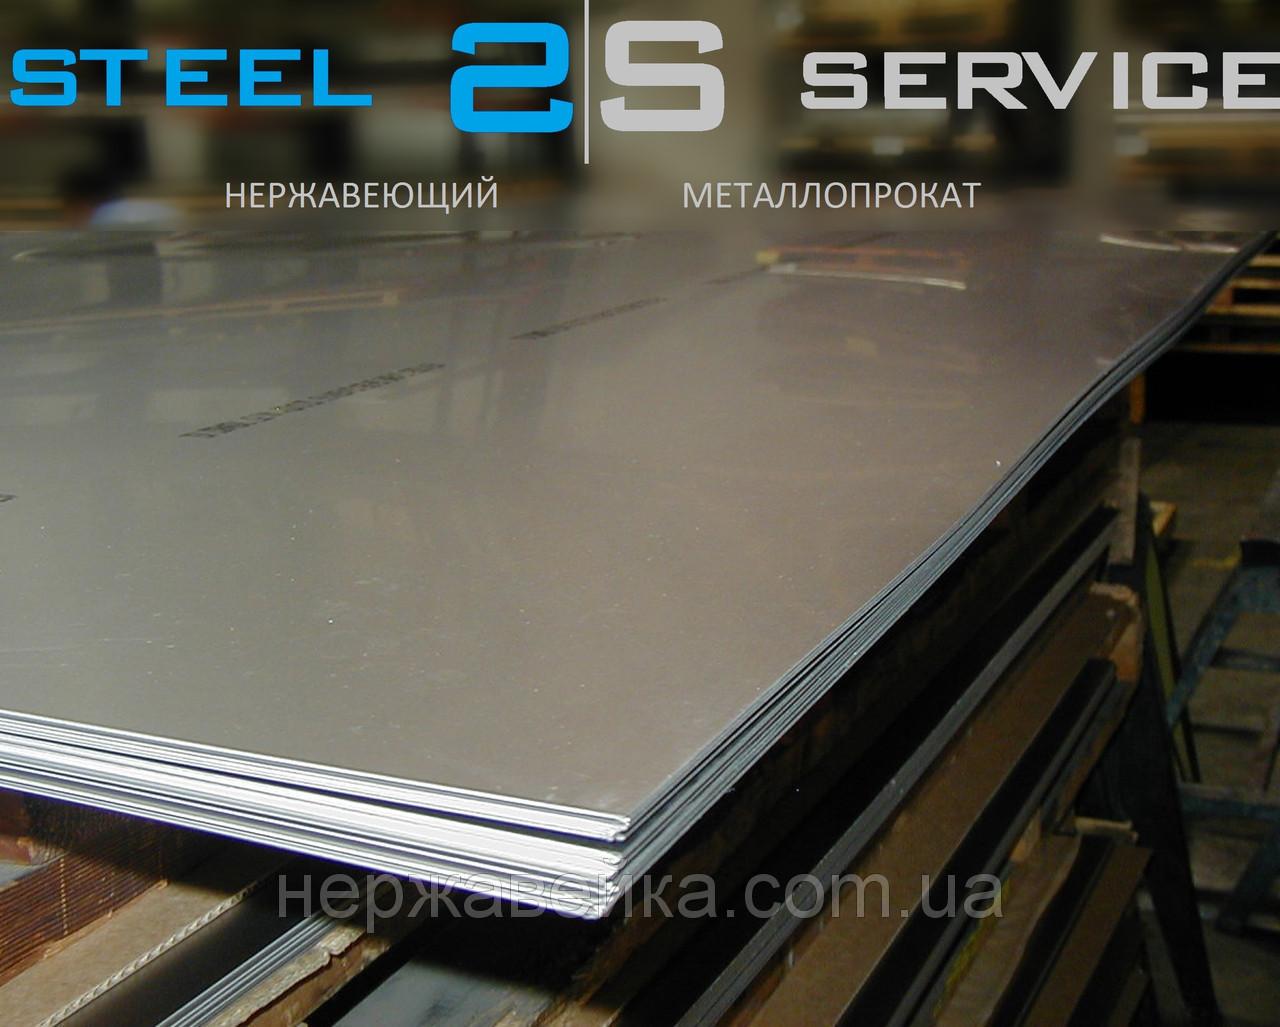 Нержавейка лист 0,8х1500х3000мм  AISI 316L(03Х17Н14М3) 2B - матовый,  кислотостойкий